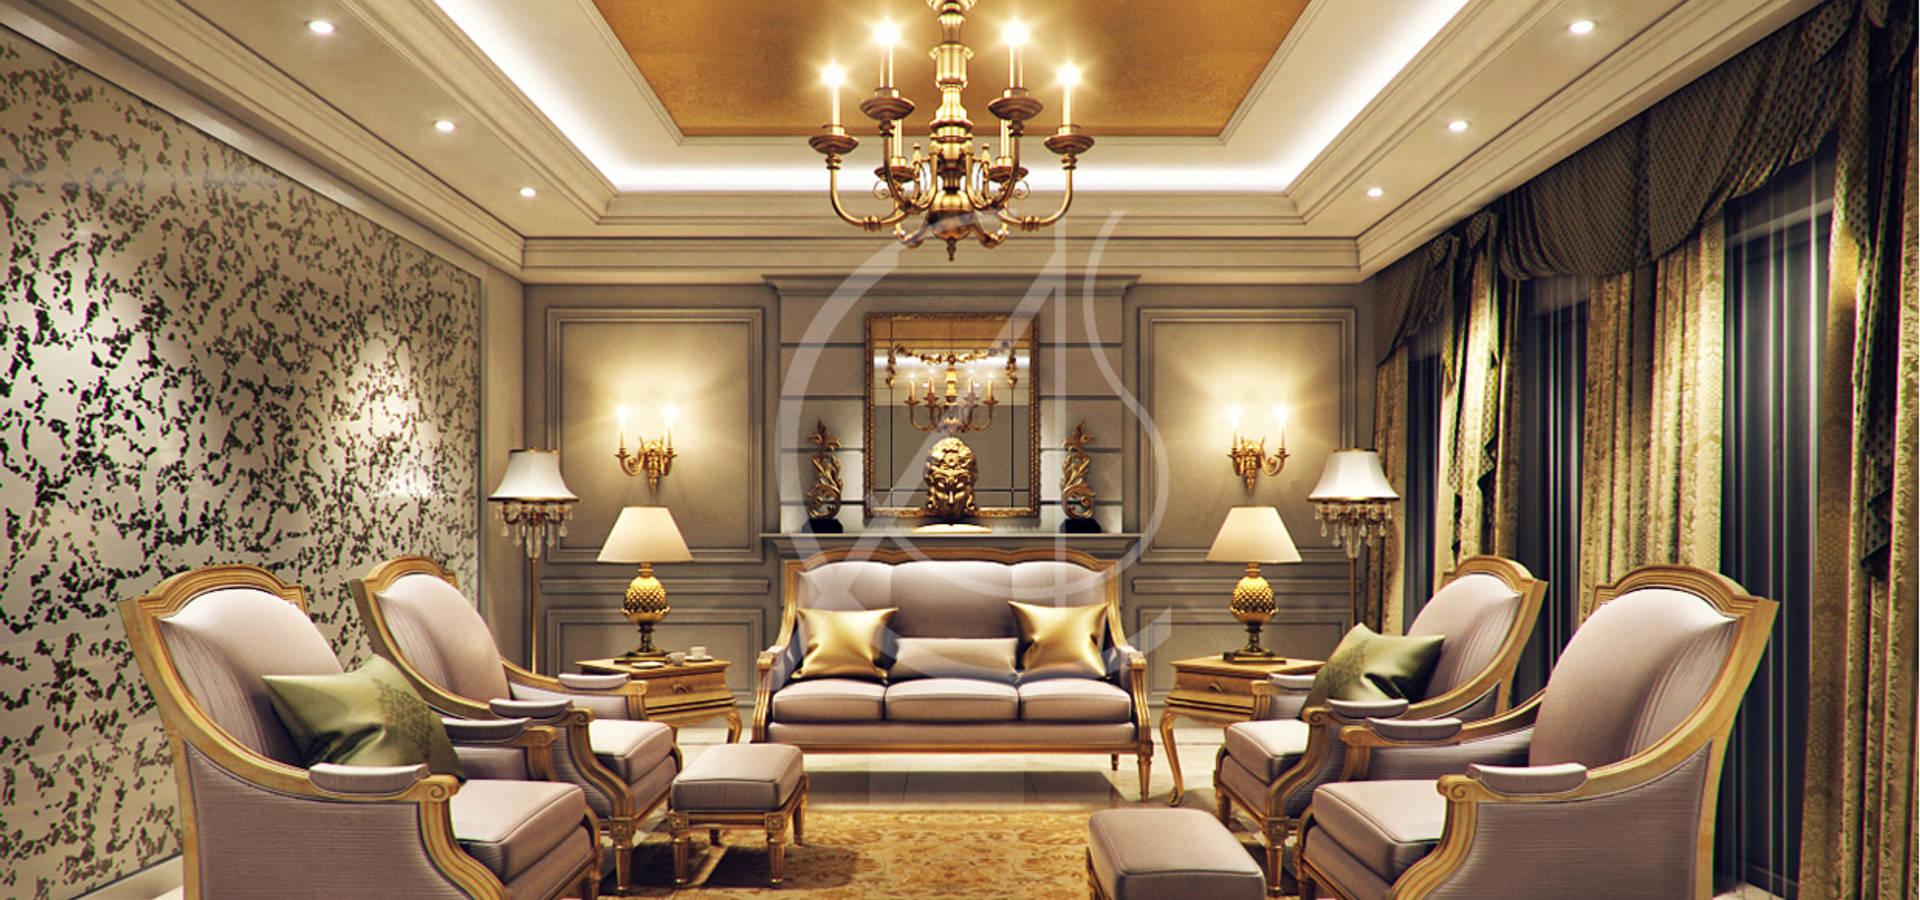 Modern Arabic House Design Par Comelite Architecture Structure And